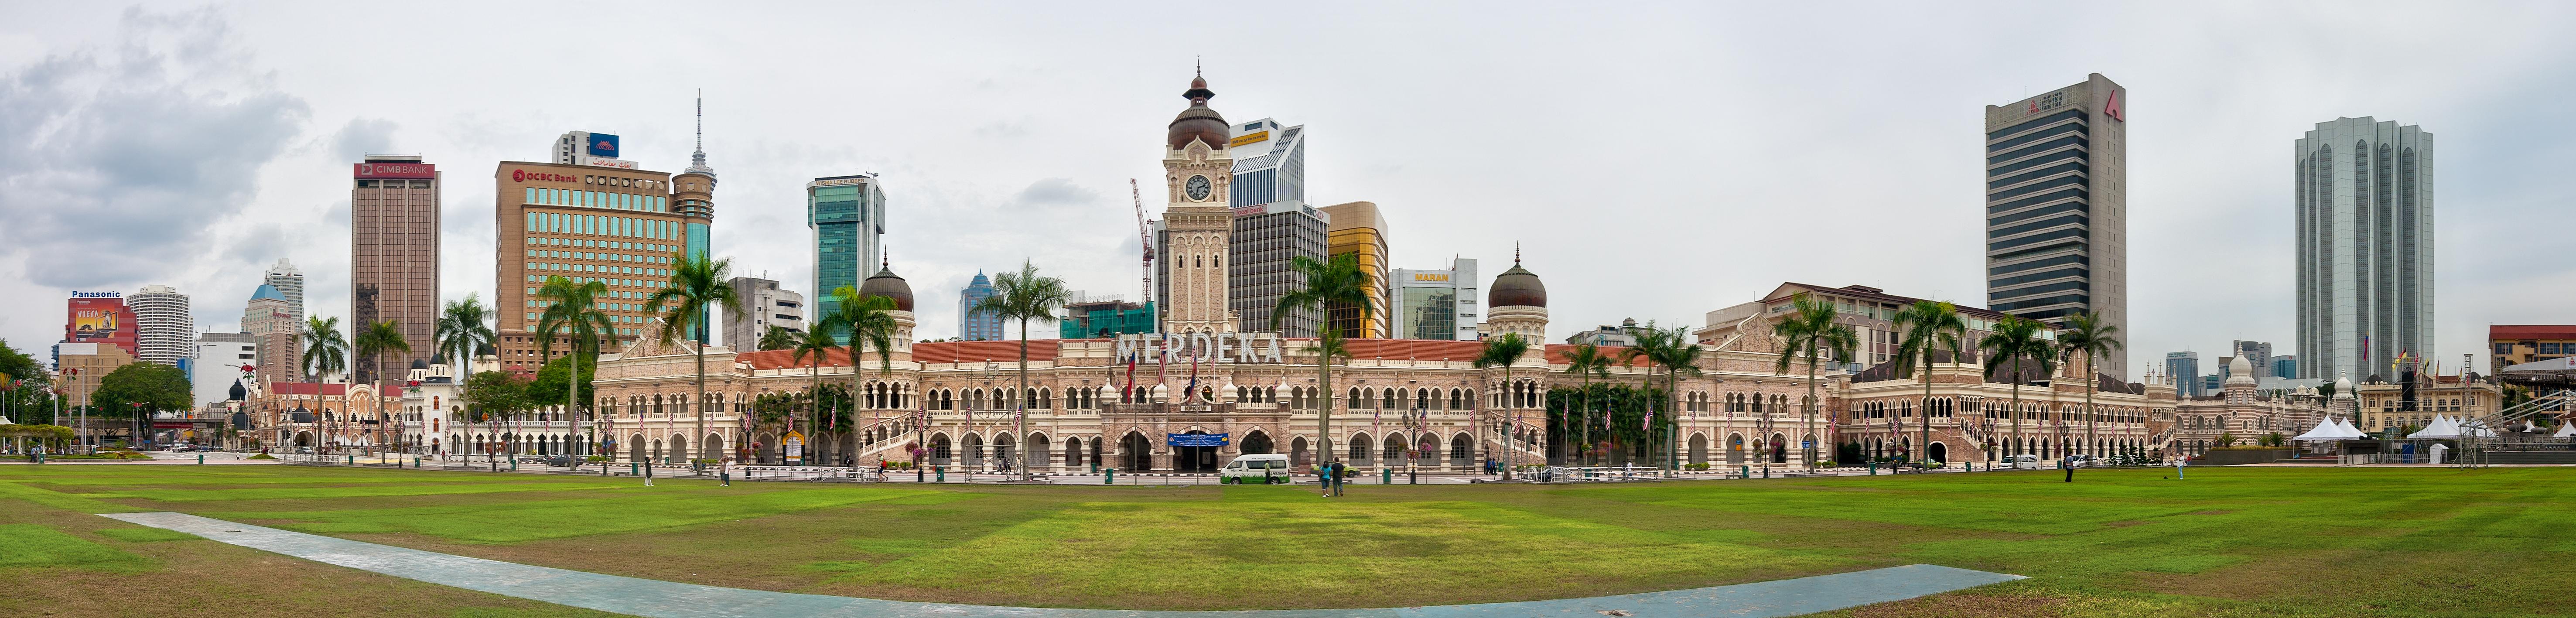 File:Merdeka Square Malaysia.jpg - Wikimedia Commons